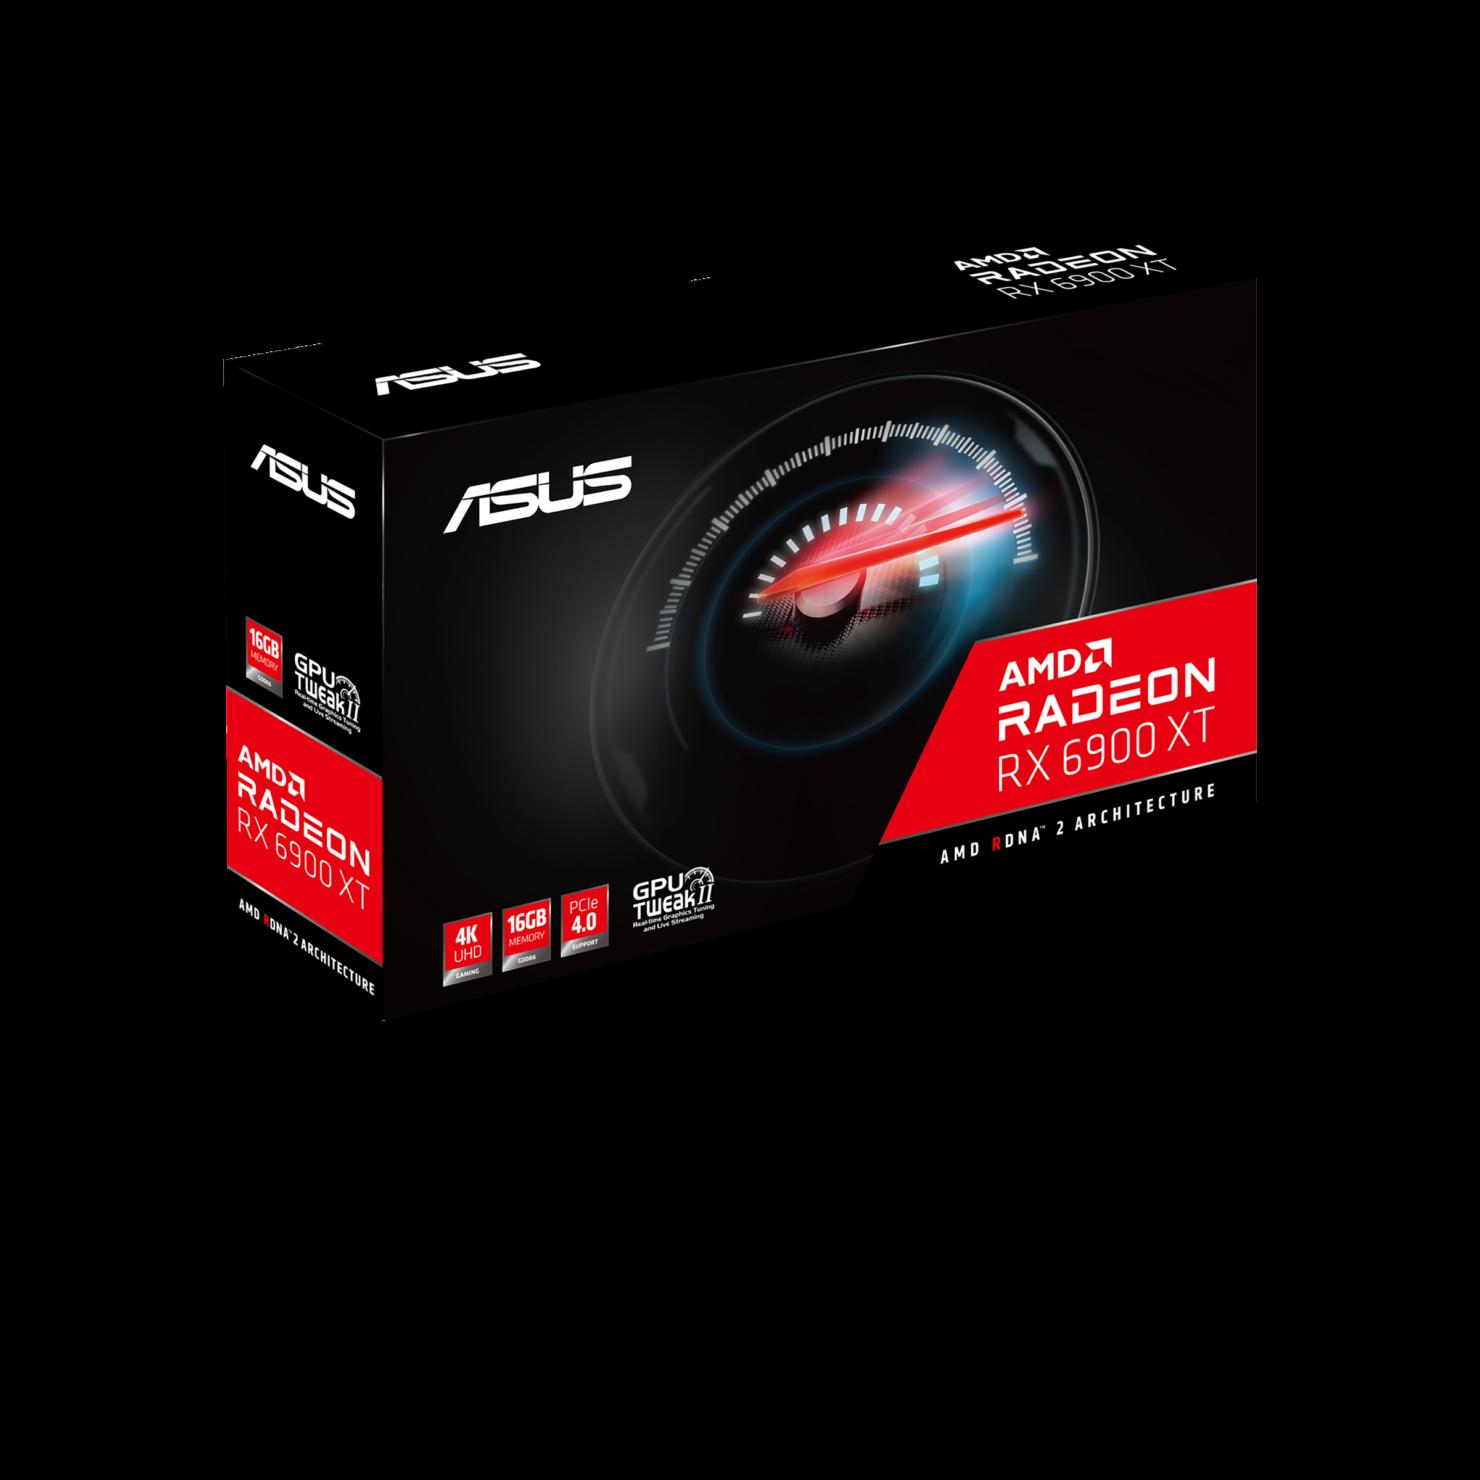 asus-radeon-rx-6900-xt-graphics-card_2